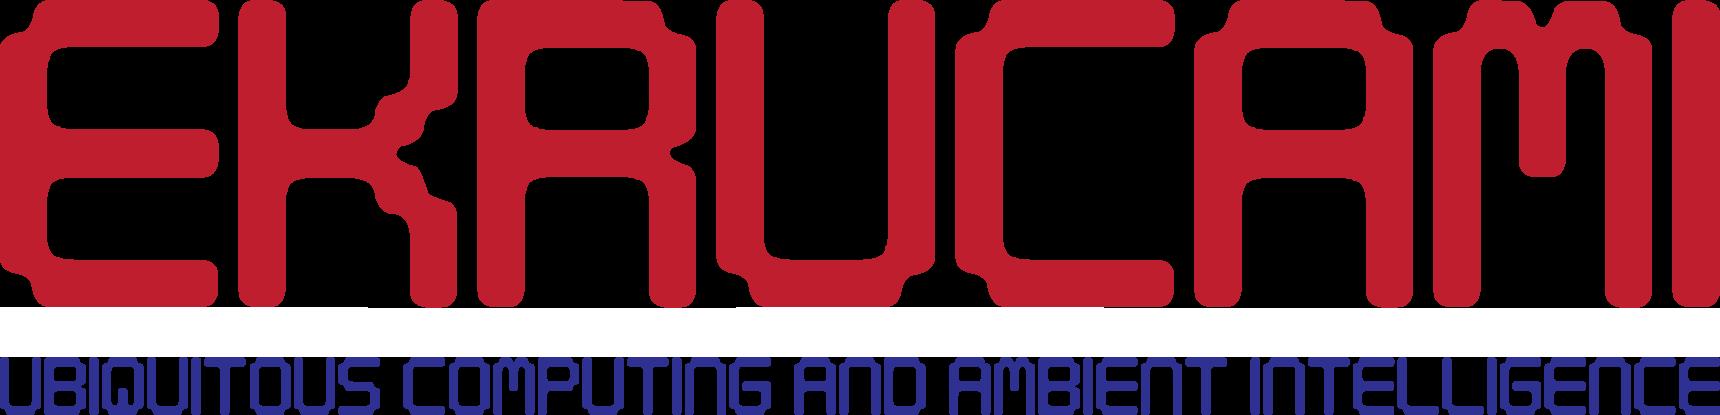 EKRUCAMI-proyecto-Ubiquitous-Computing-Ambient-Intelligence